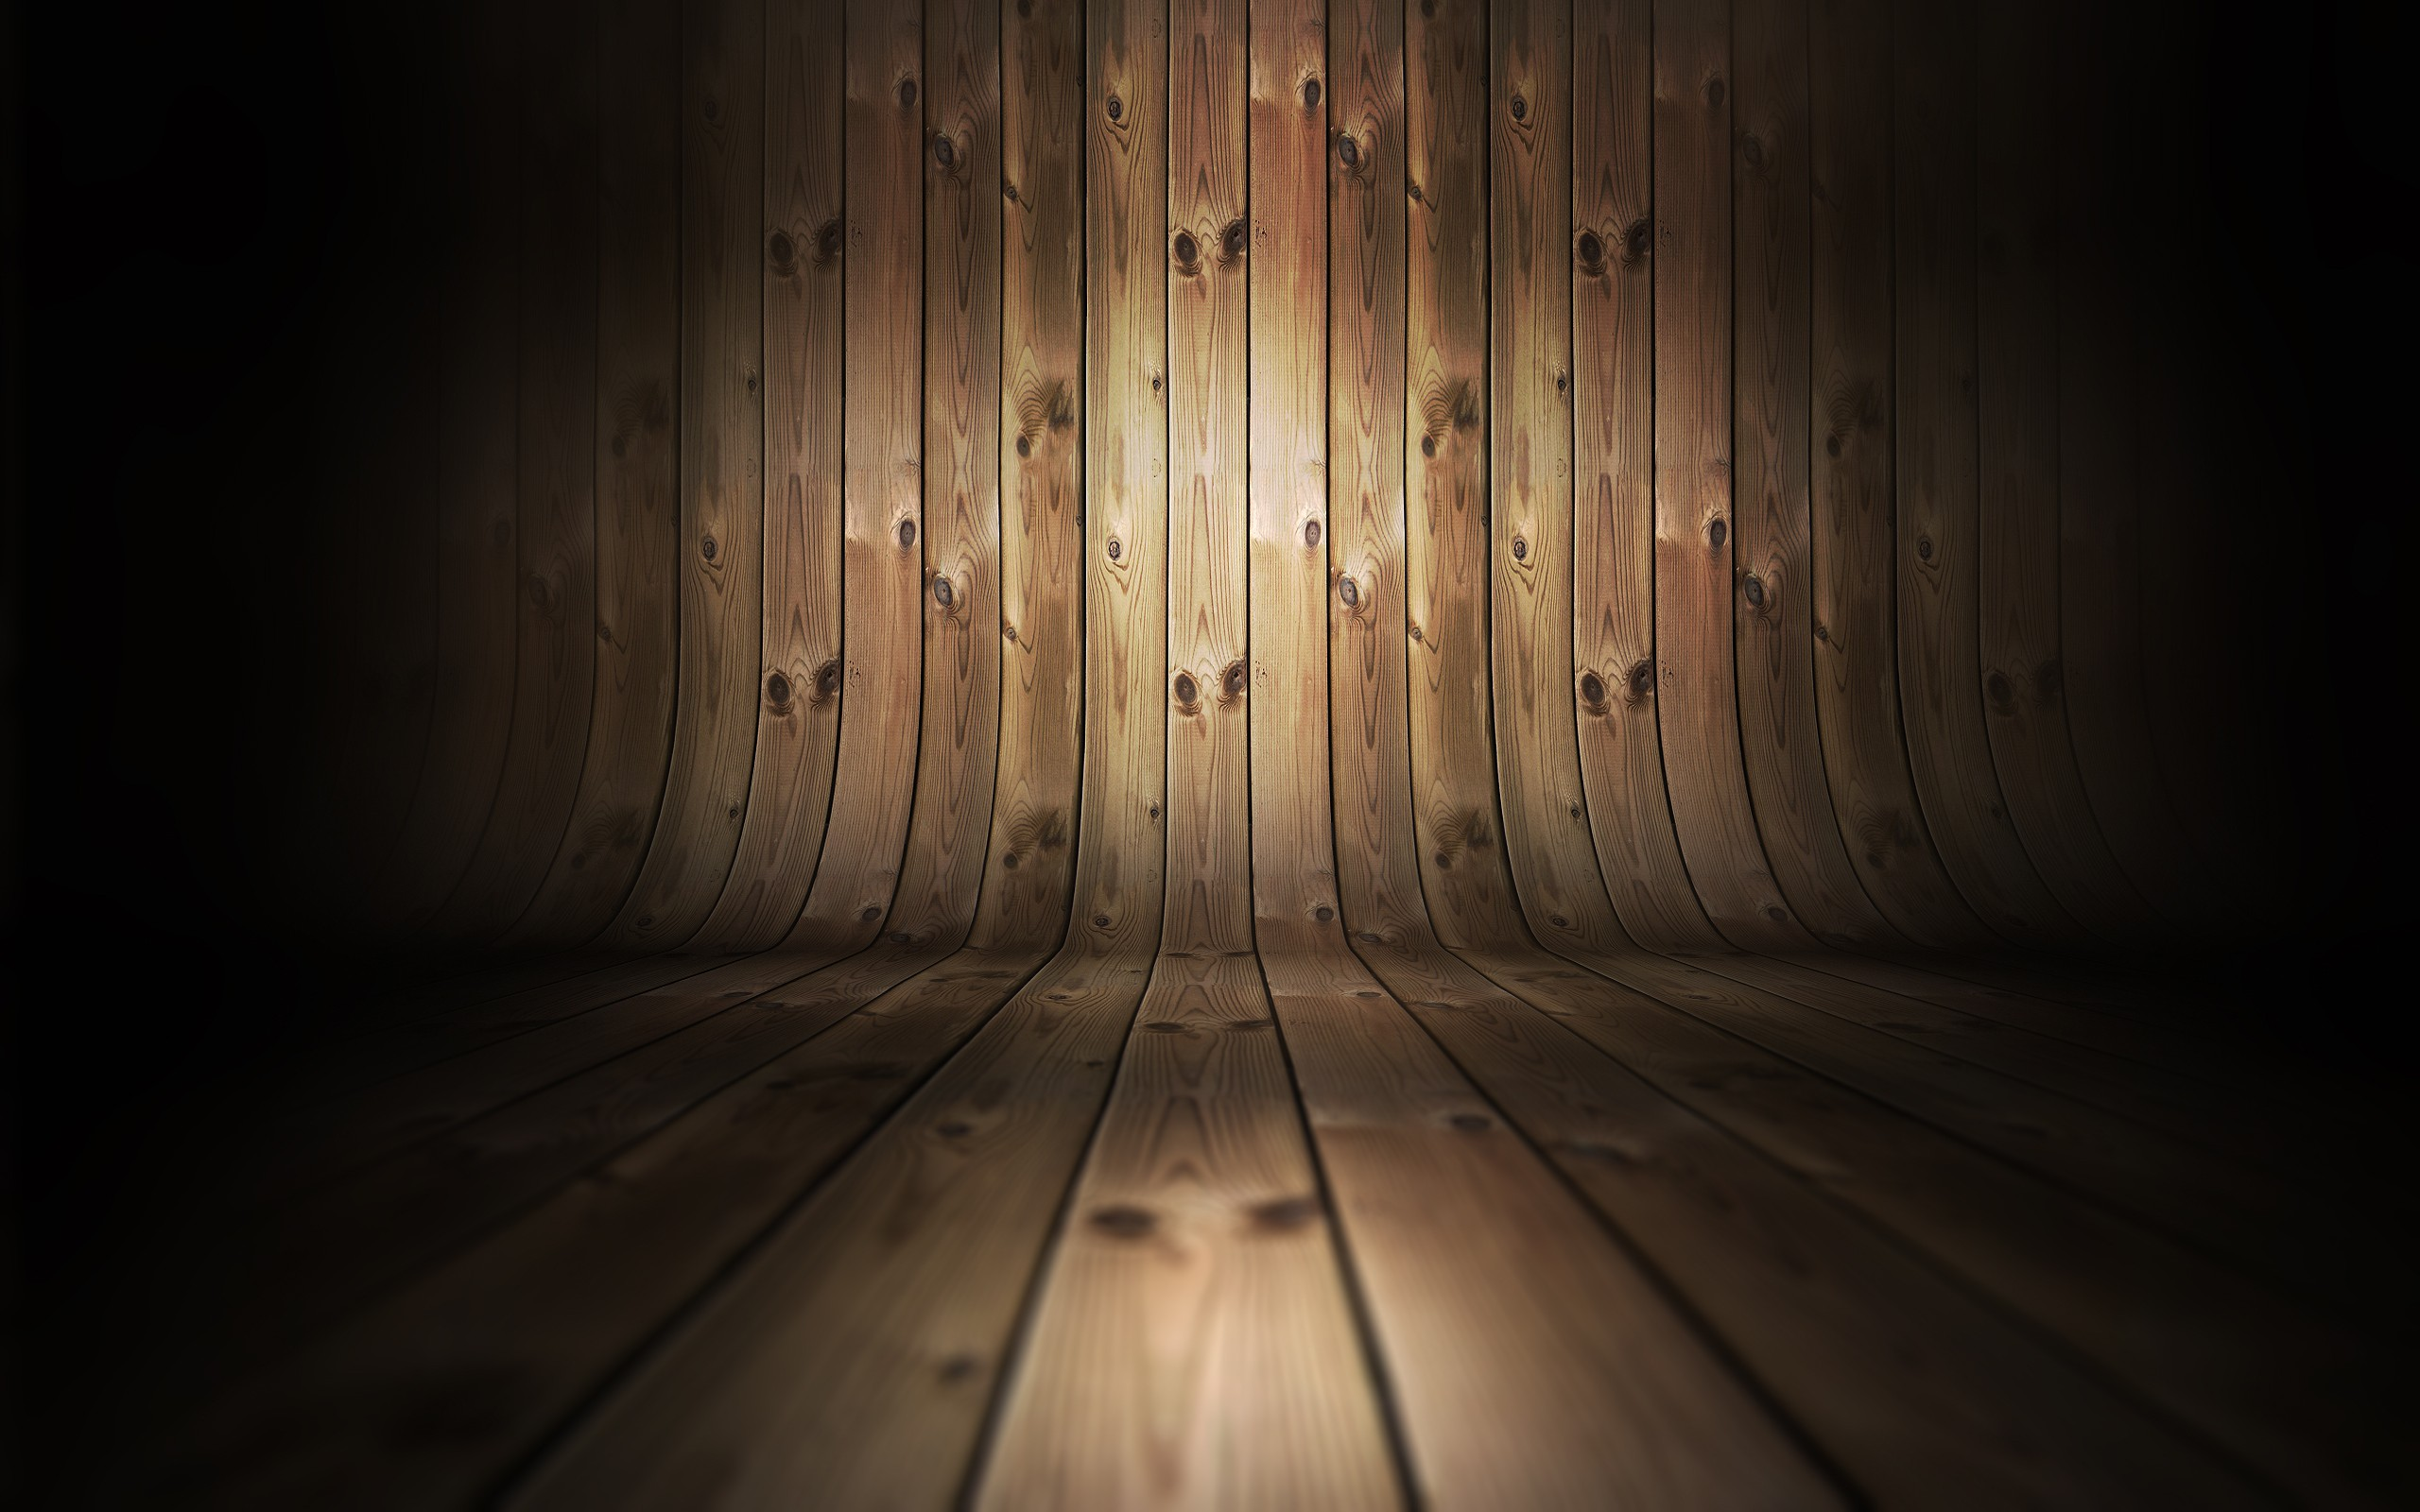 Hd wallpaper wood - Wood Curved 2560x1600 Hd Wallpaper Wooded Hills Church